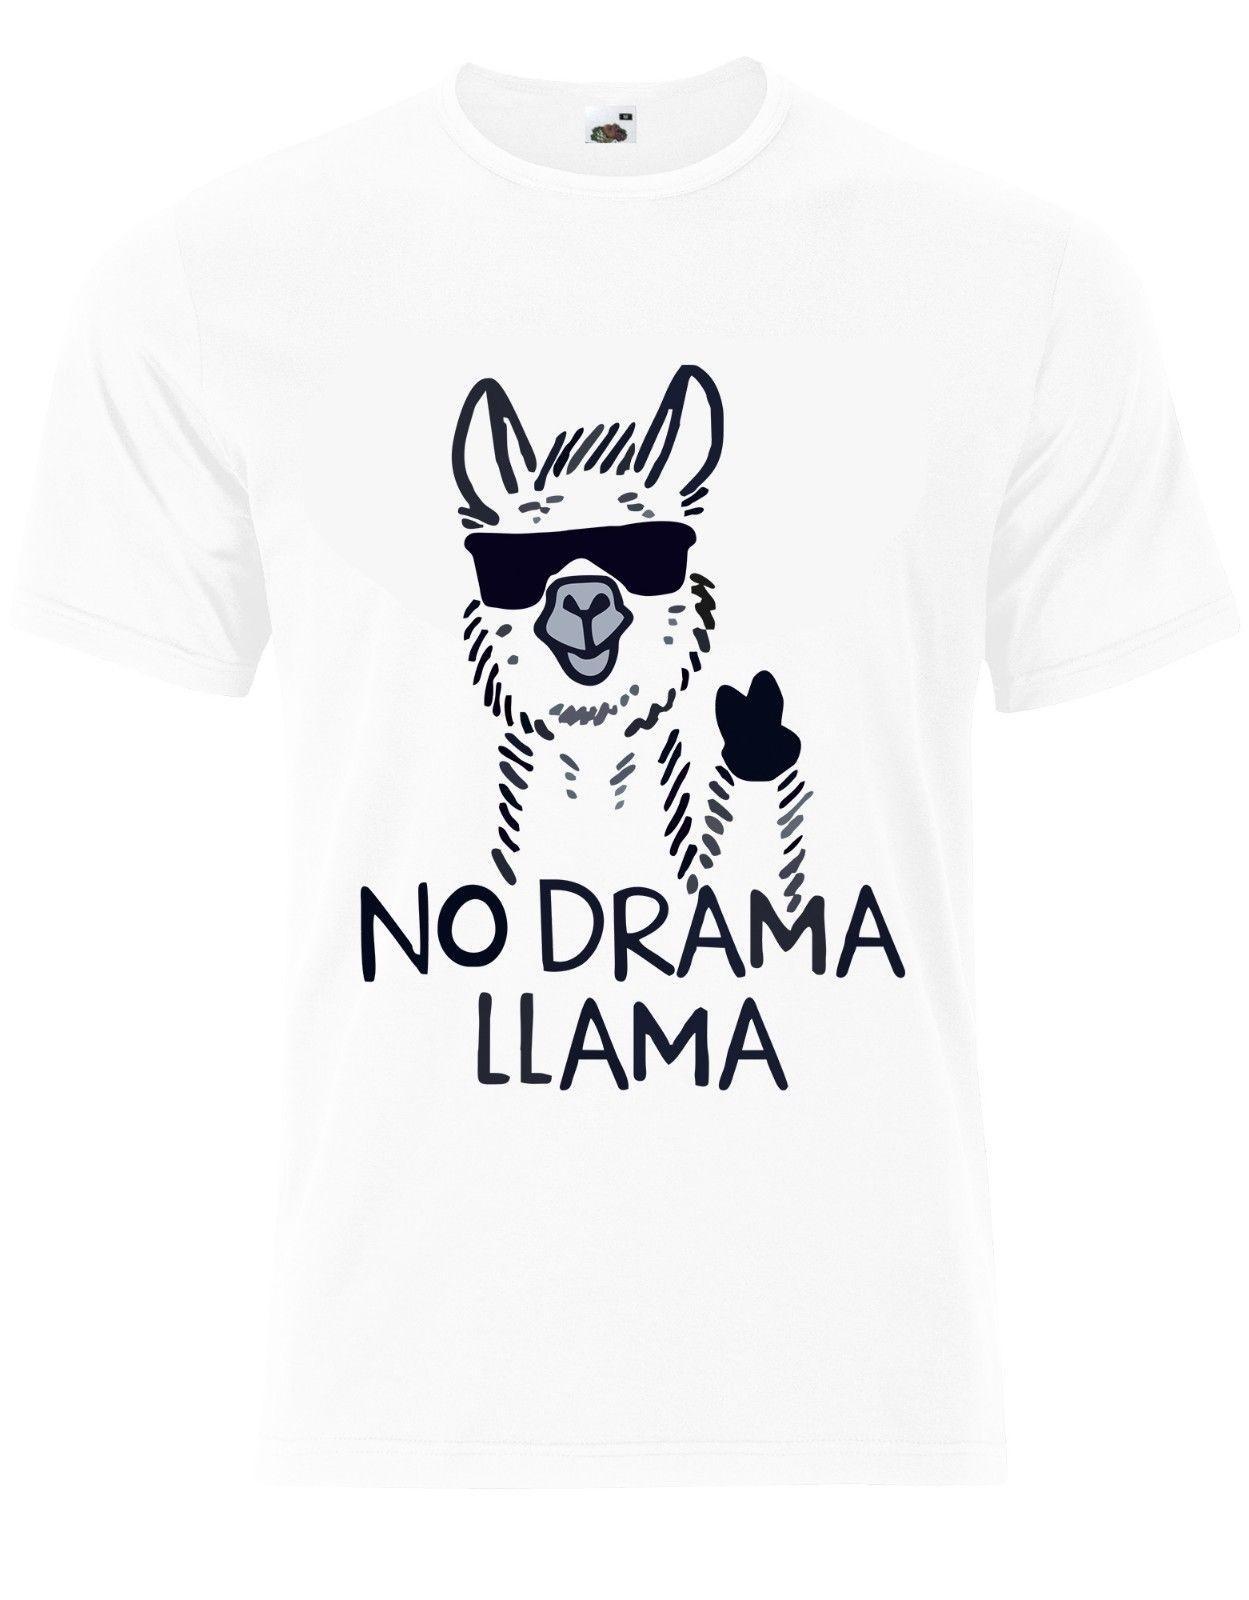 6d280c7aa No Drama Llama Funny Animal Quote Mens Tshirt Tee Top AJ84 Buy Shirts T  Shirt Designers From Passion90, $11.48| DHgate.Com